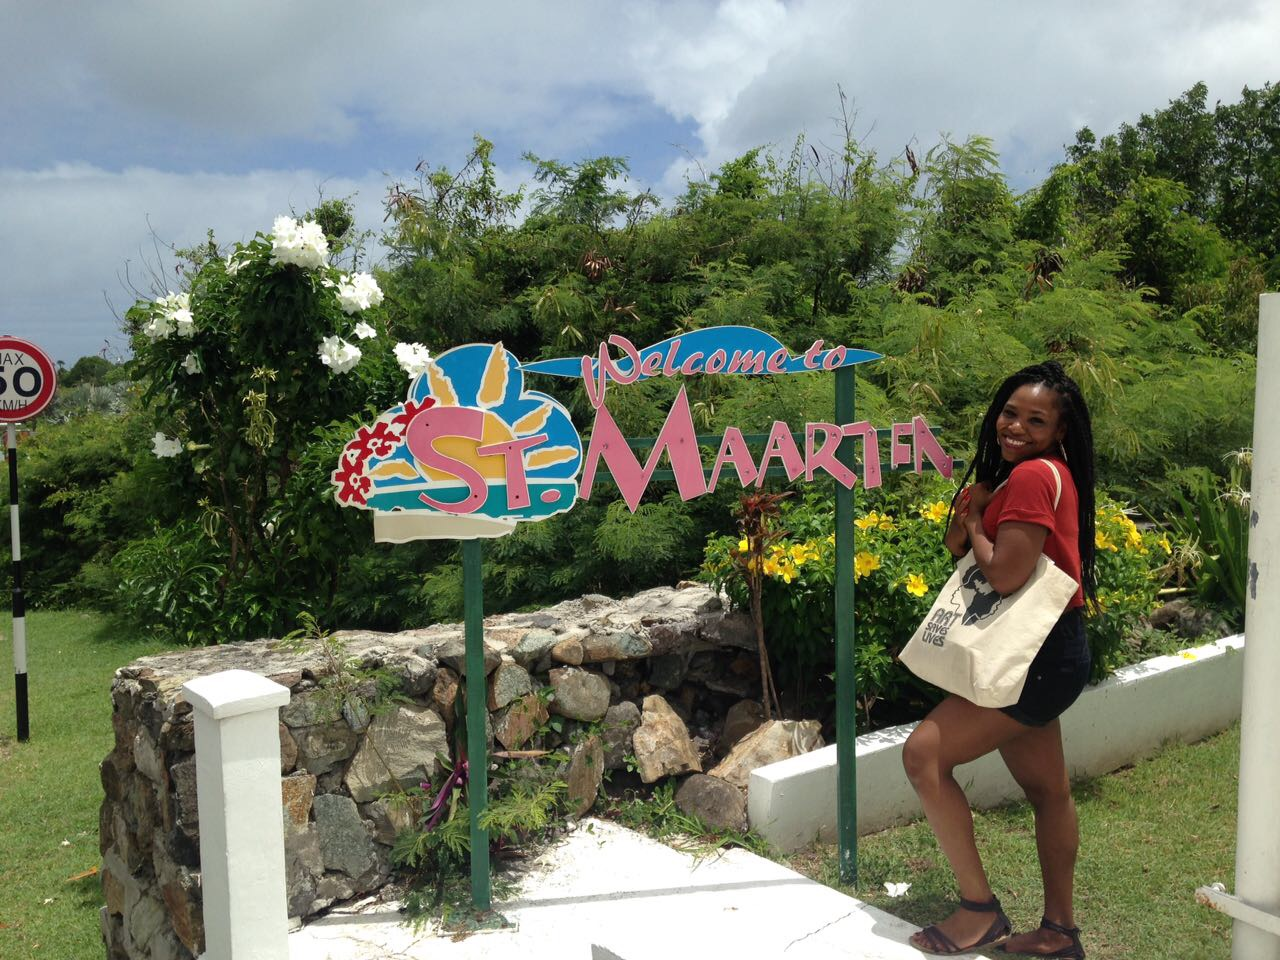 First time in St Maarten to teach!